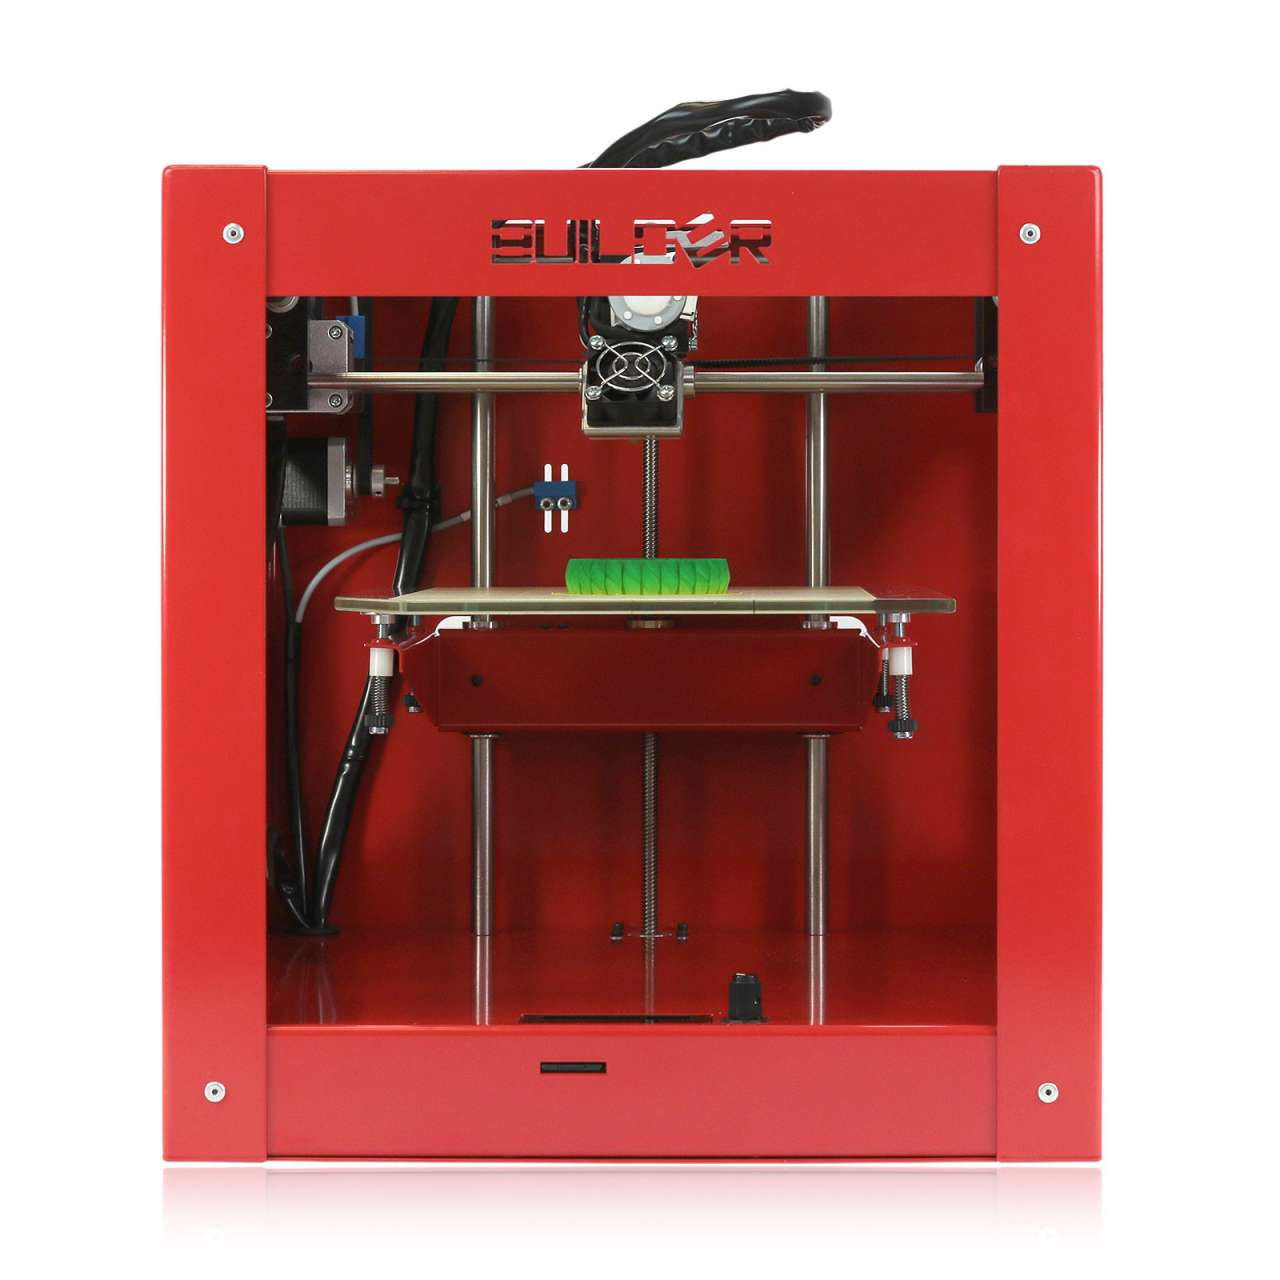 Code-P West 3D Printer Builder Dual-Feed FDM 0.1mm 3D Drucker max. Baugröße 220 x 210 x 164 mm DRUBUI01